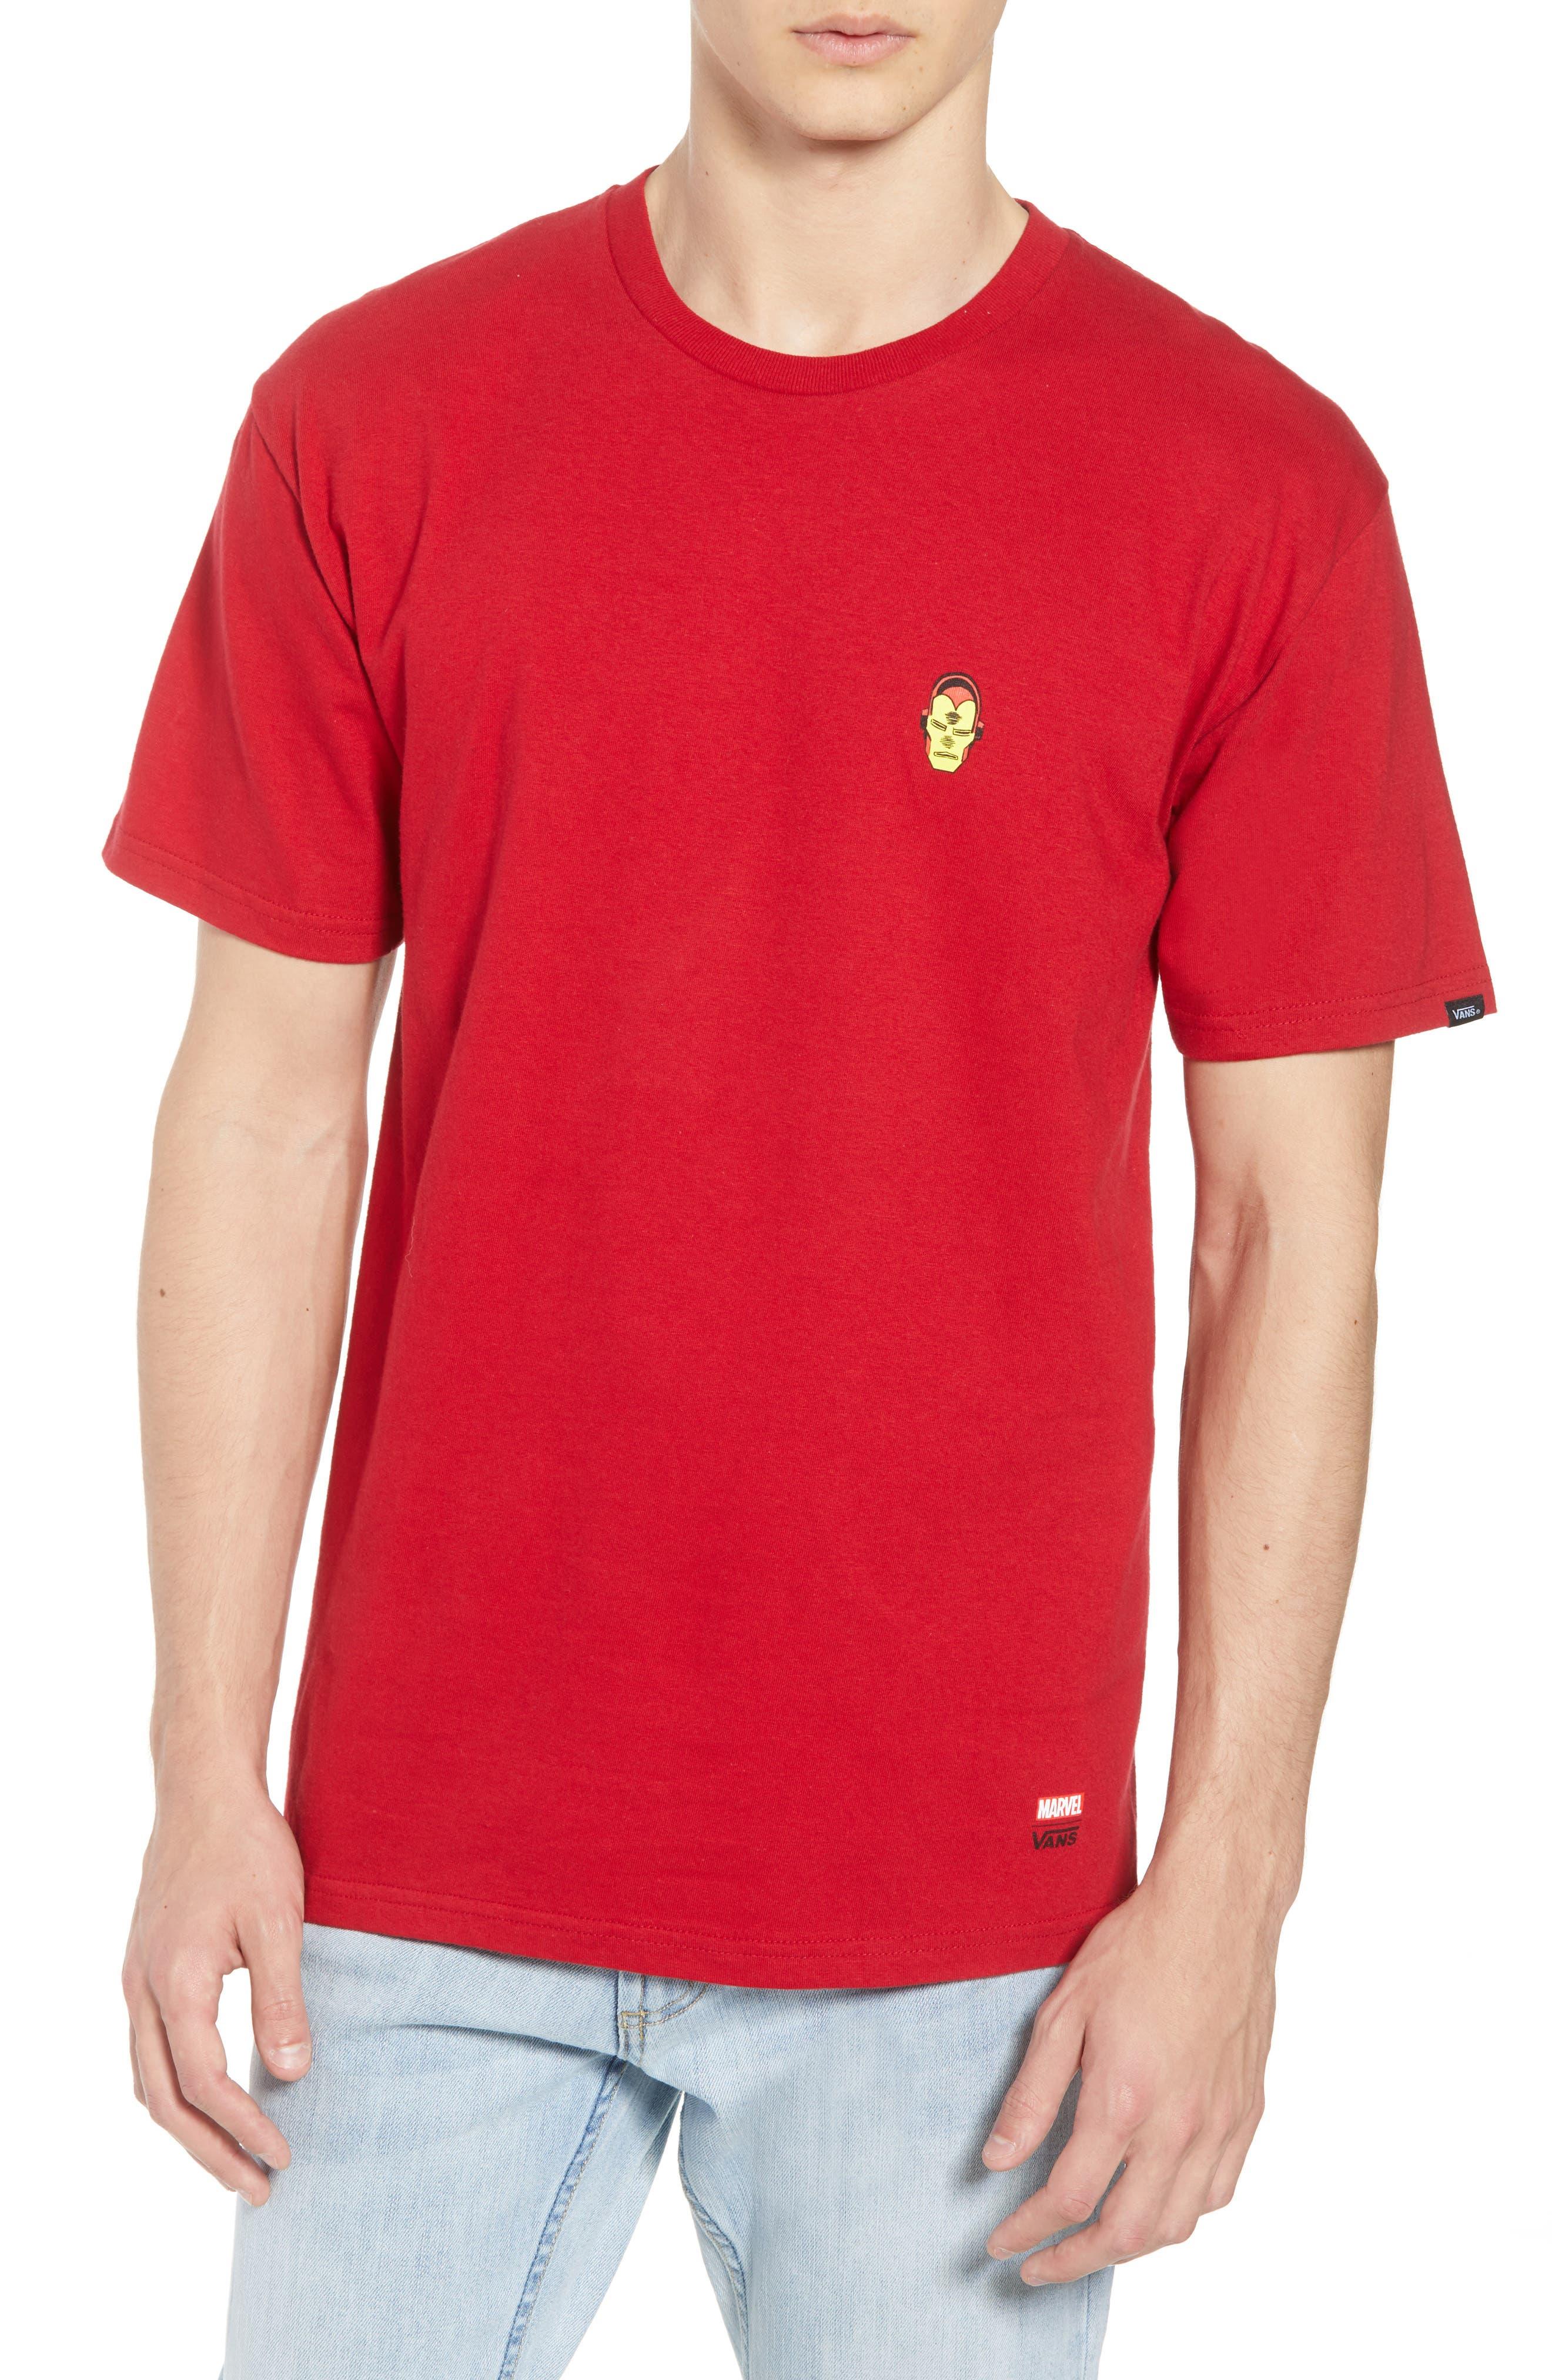 x Marvel<sup>®</sup> Iron Man T-Shirt,                             Main thumbnail 1, color,                             601